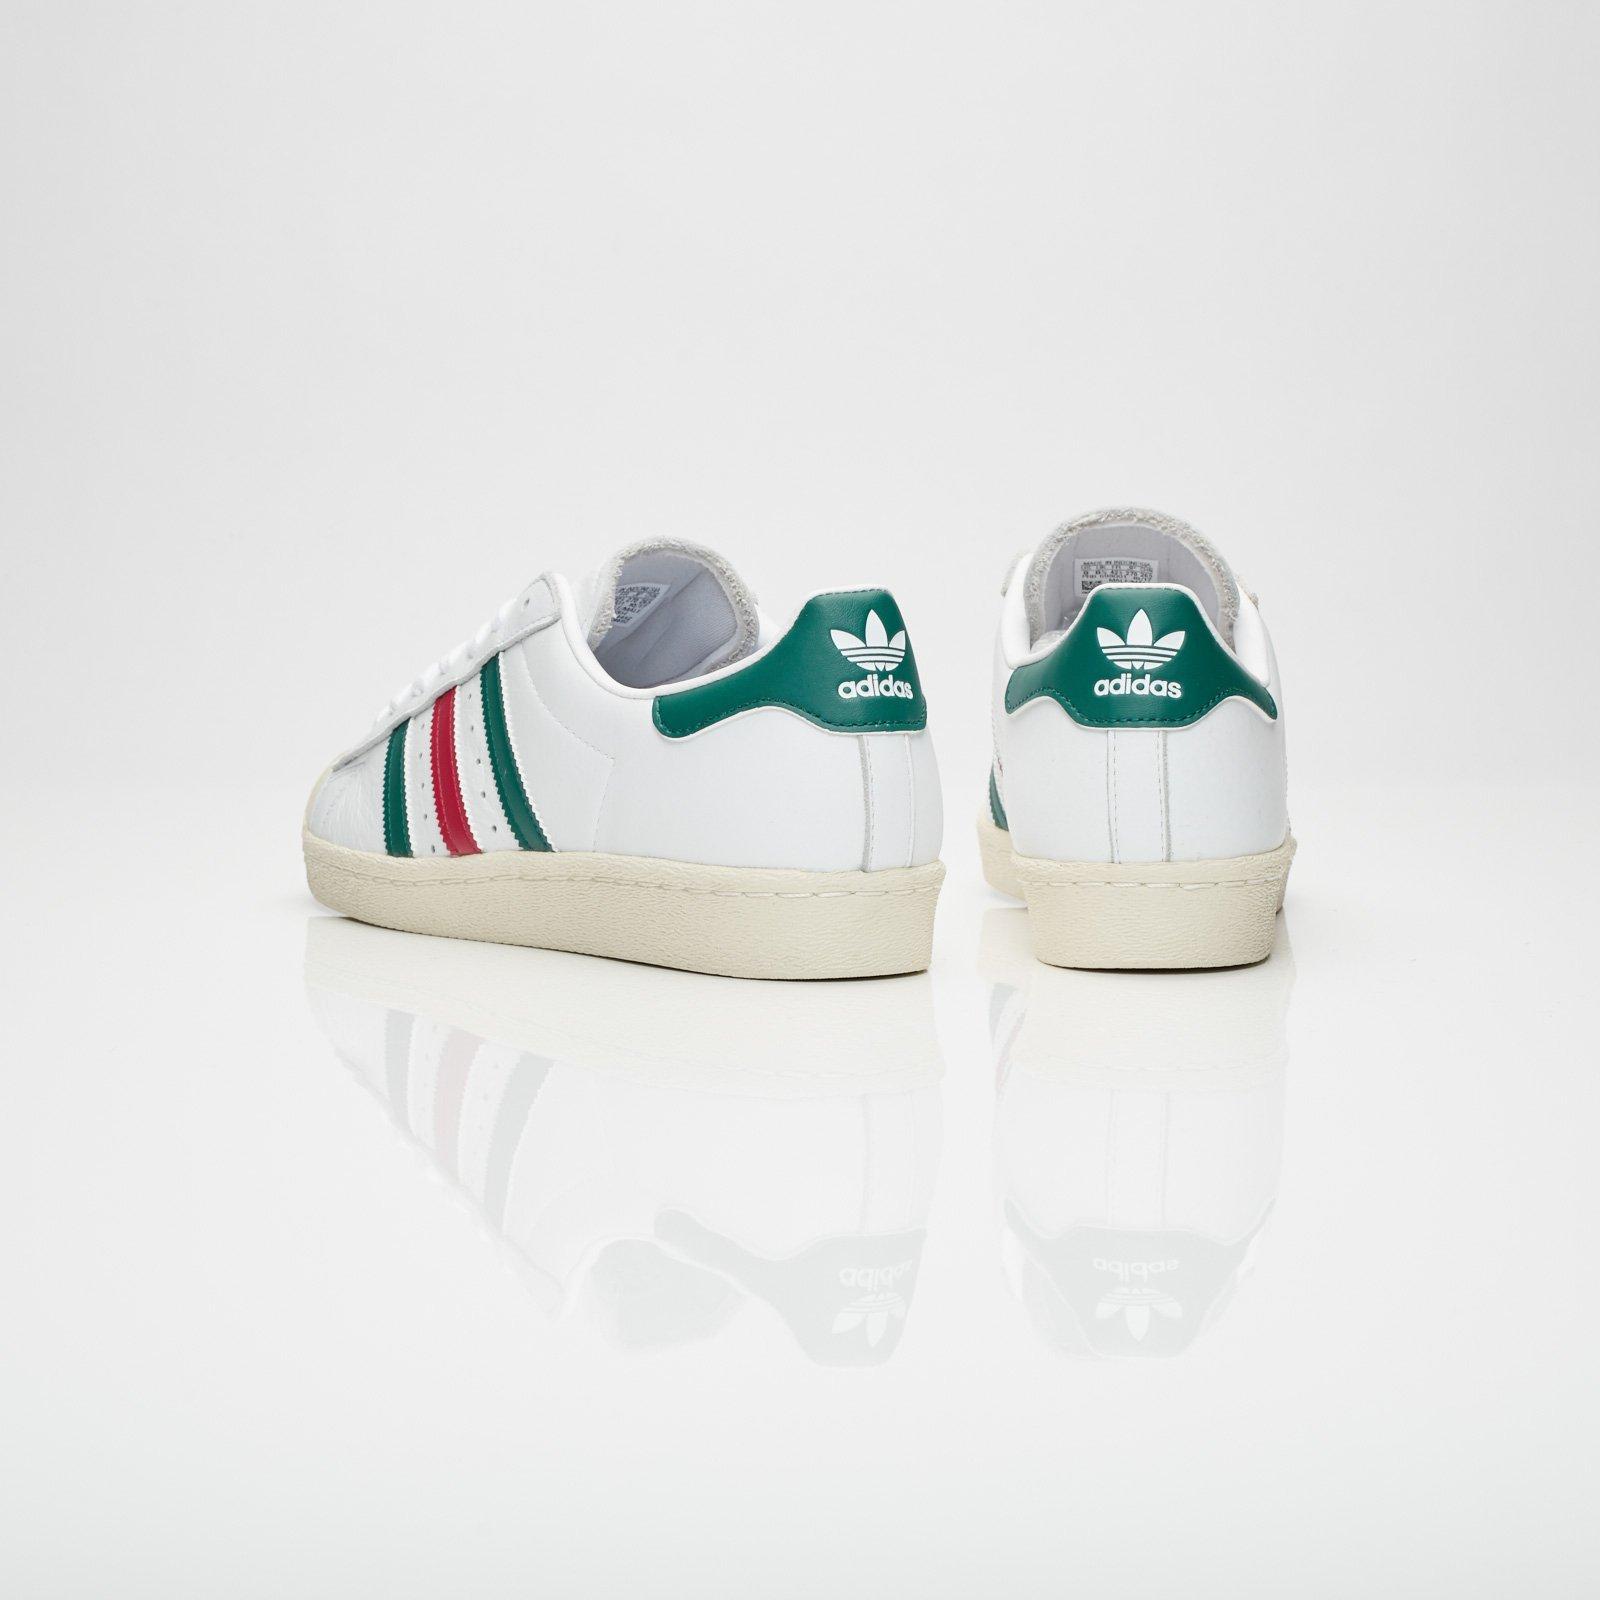 newest 4c312 b2d26 adidas Originals Superstar 80s adidas Originals Superstar 80s ...